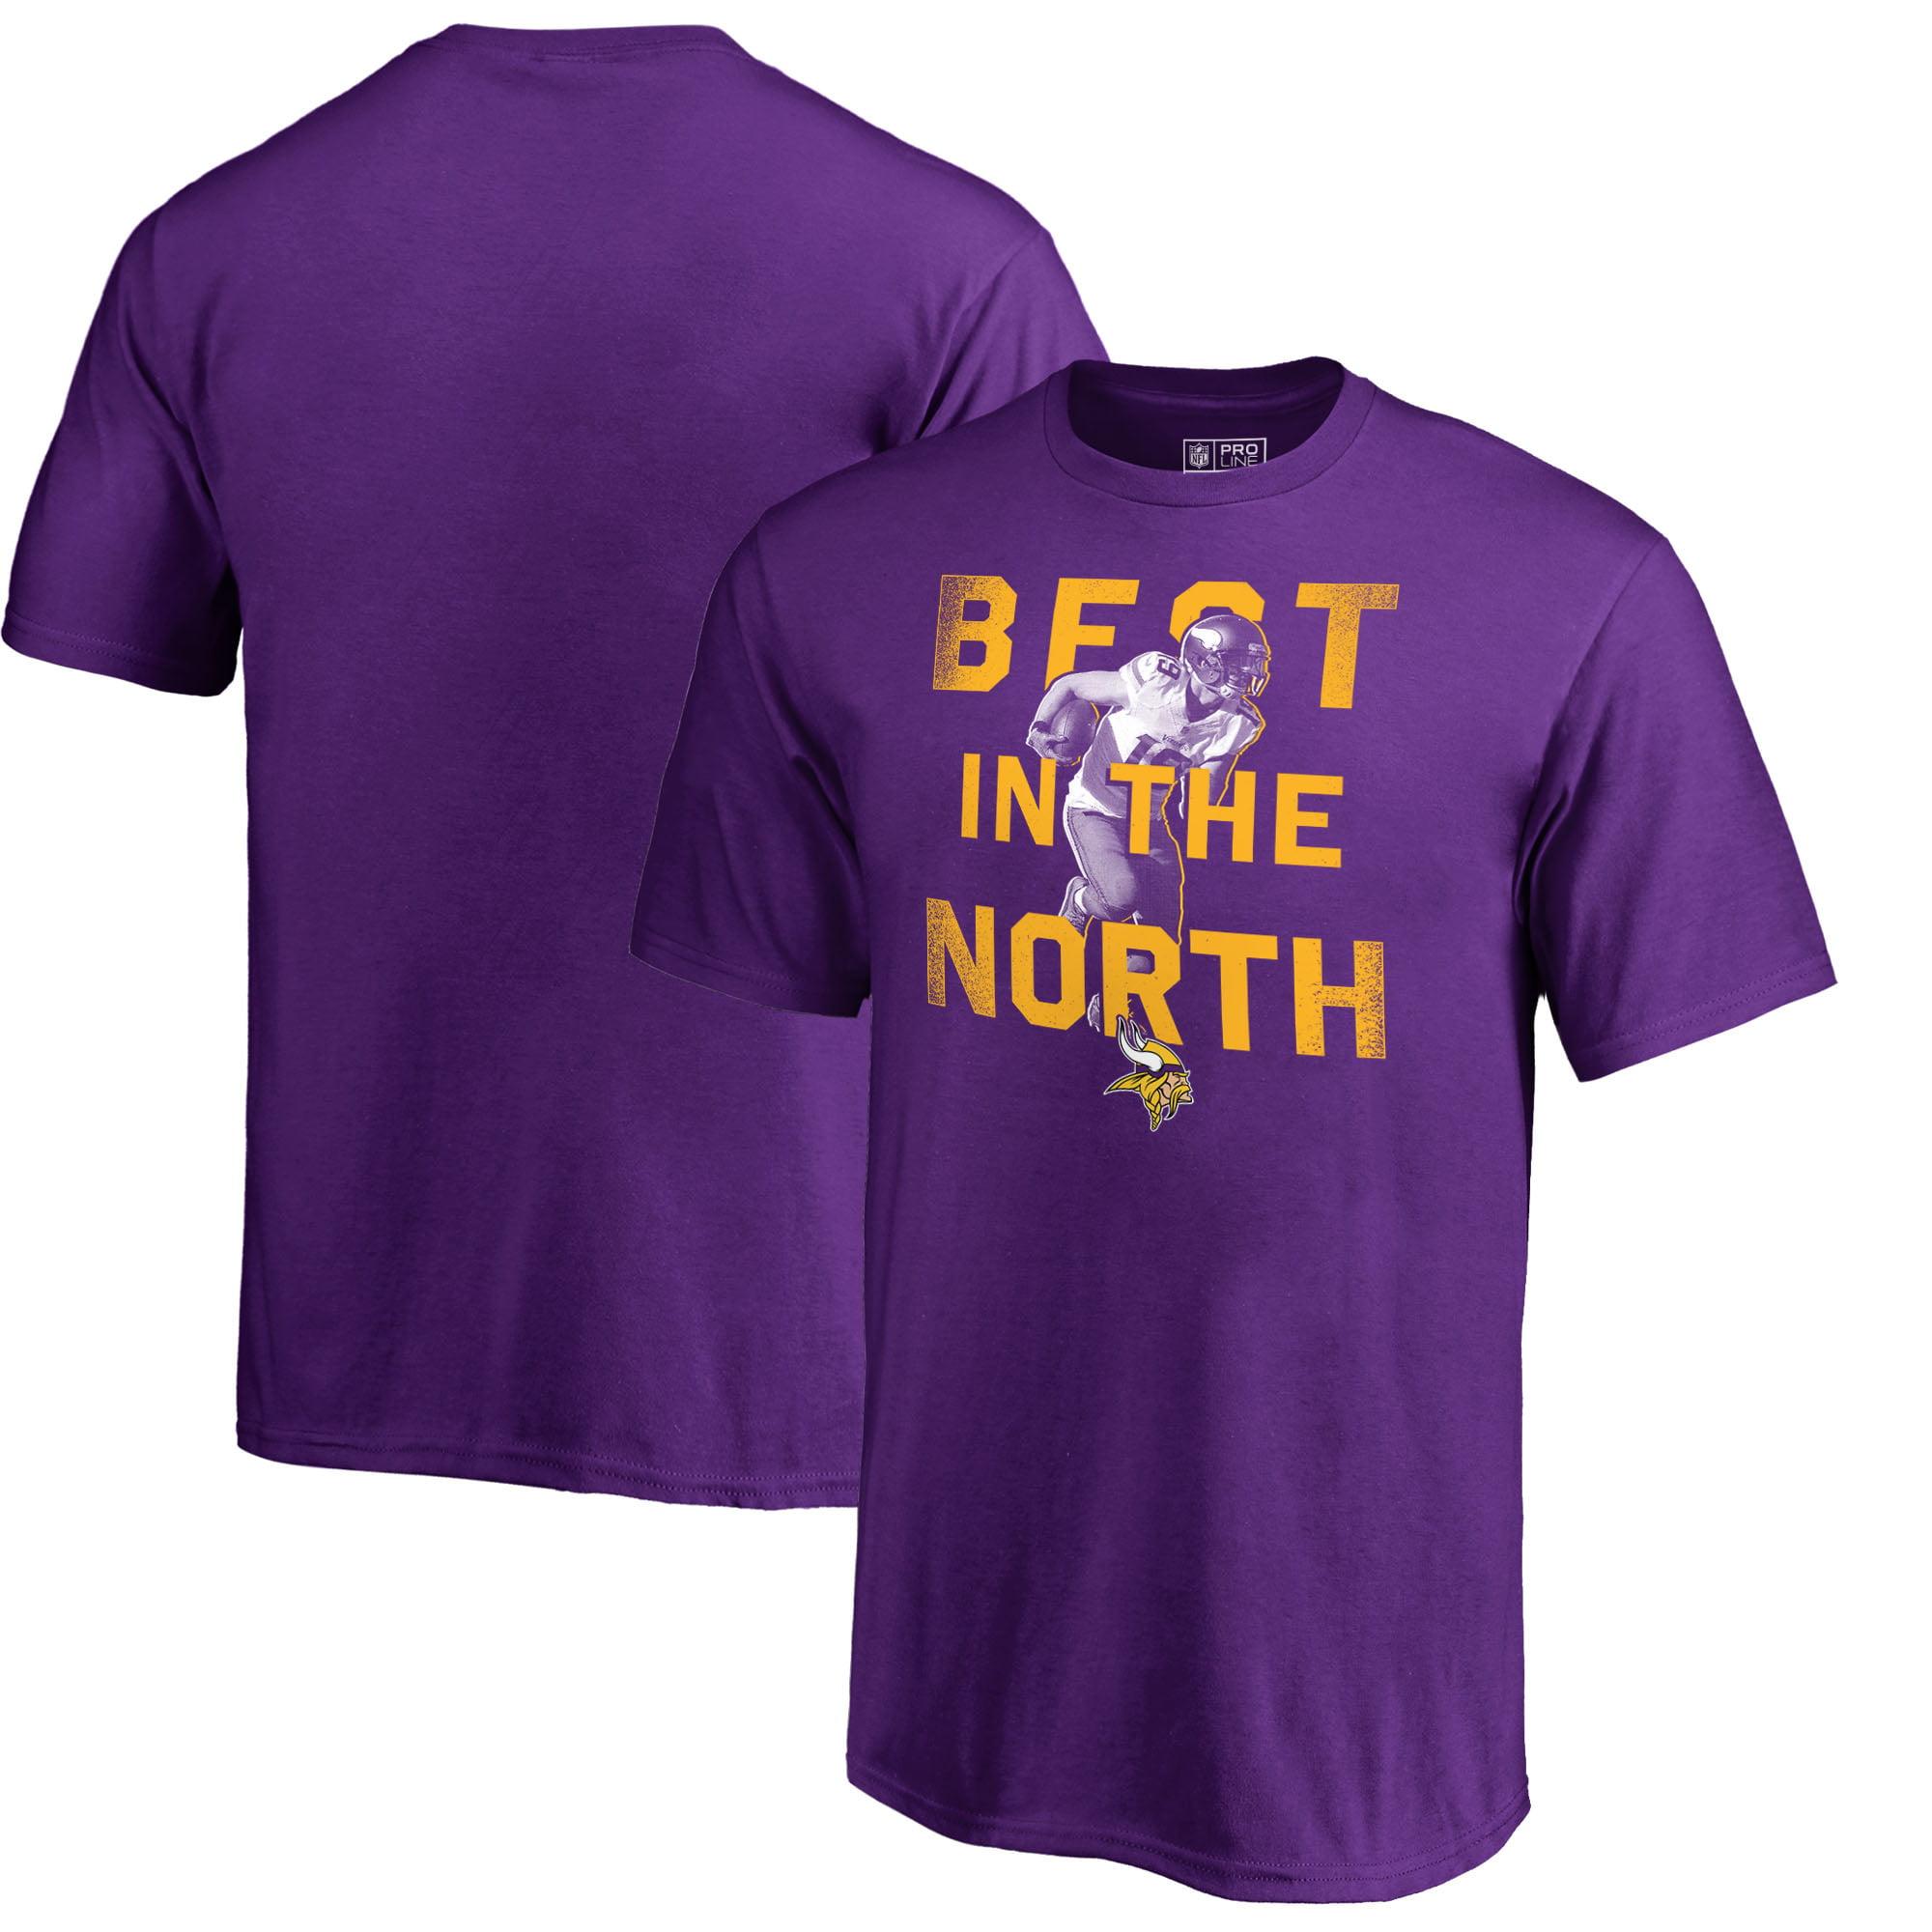 Adam Thielen Minnesota Vikings NFL Pro Line by Fanatics Branded Youth Hero T-Shirt - Purple